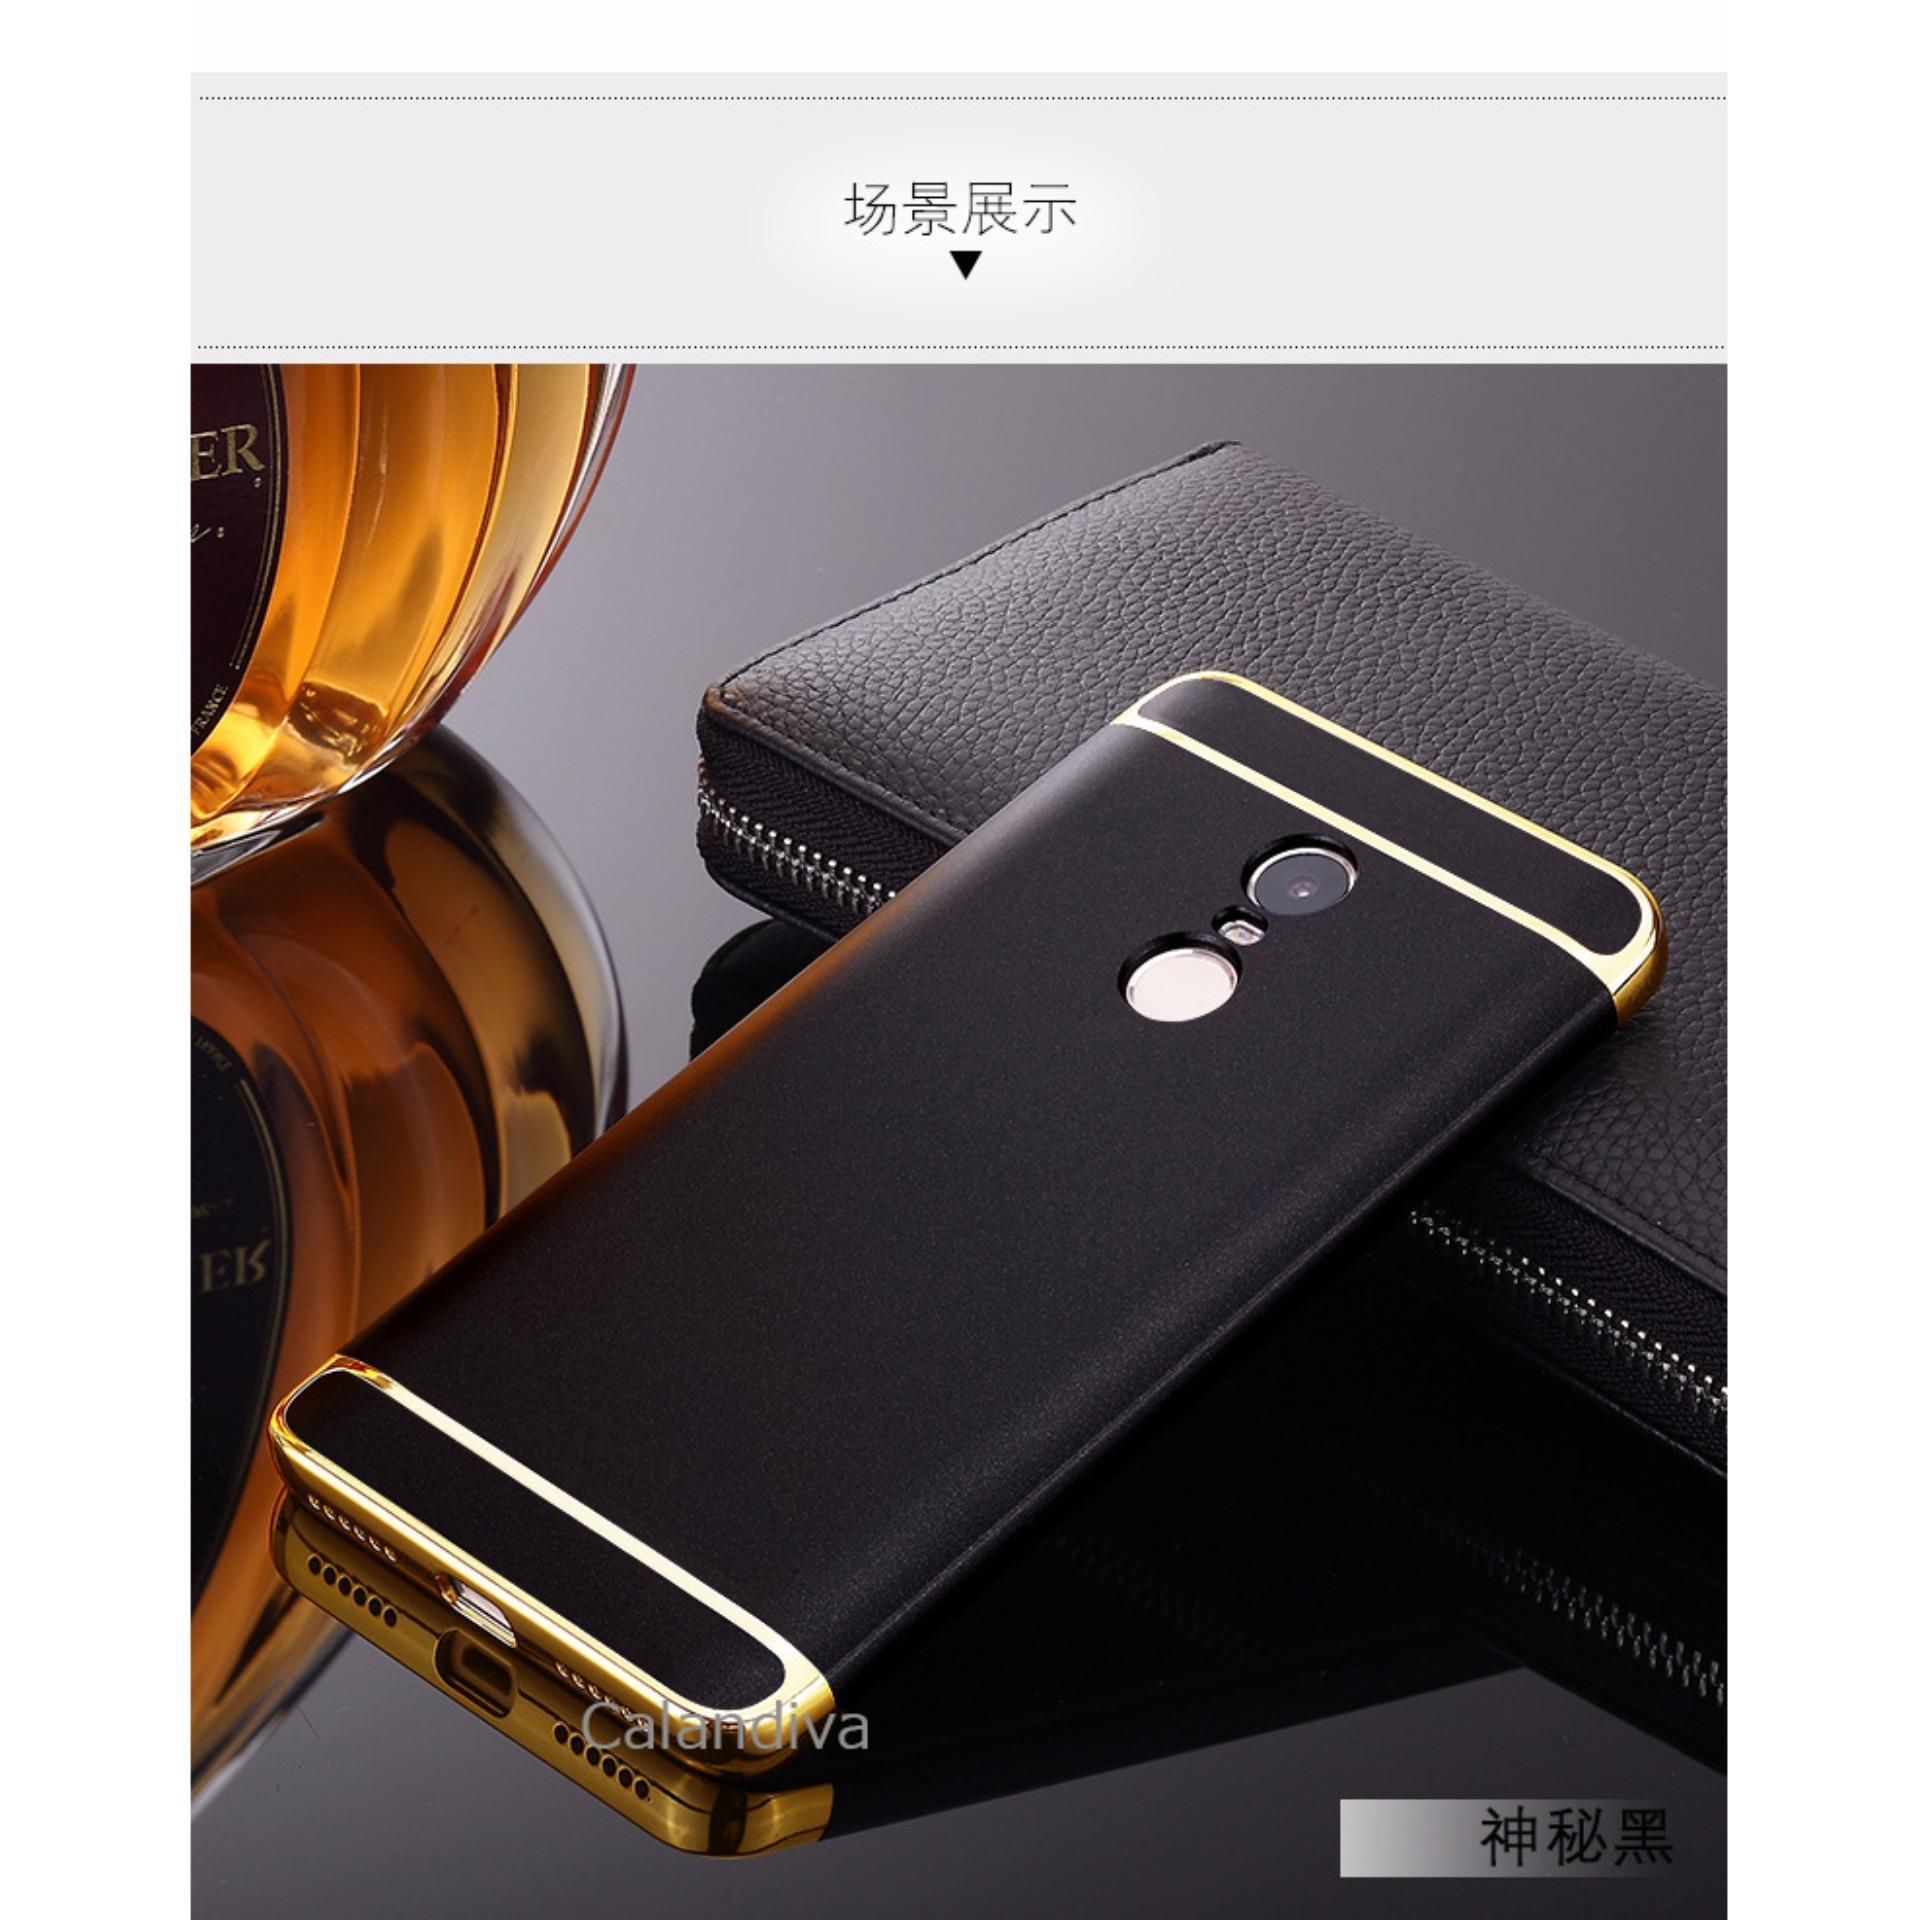 ... Calandiva Premium Quality Elegance Protection Hardcase for Xiaomi Redmi Note 4 Mediatek / Redmi Note 4x ...